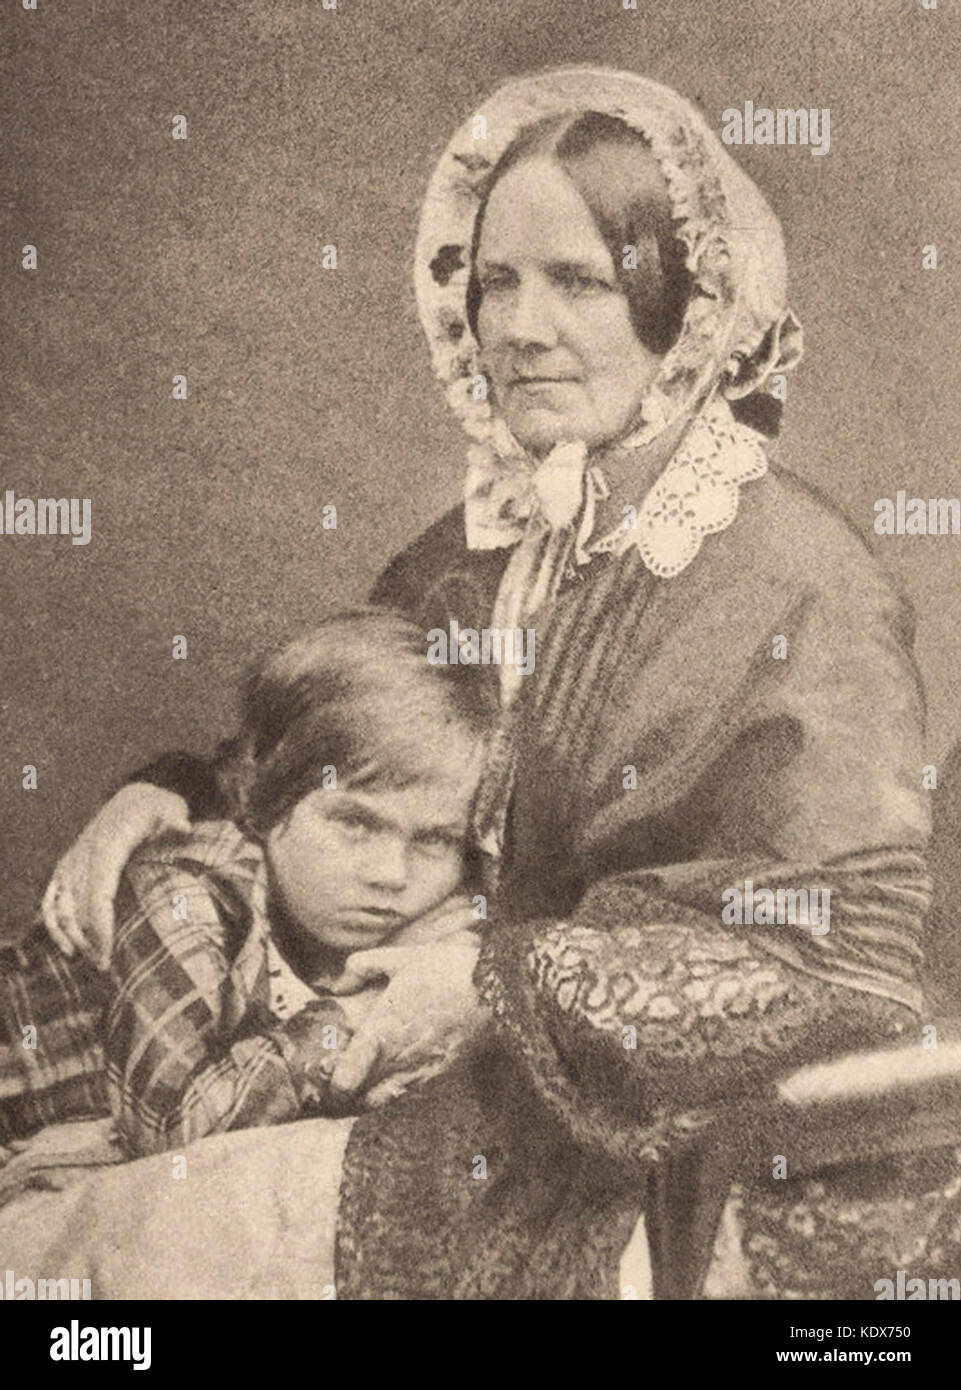 Emma Darwin, wife of Charles Darwin, with son Leonard Darwin - Stock Image